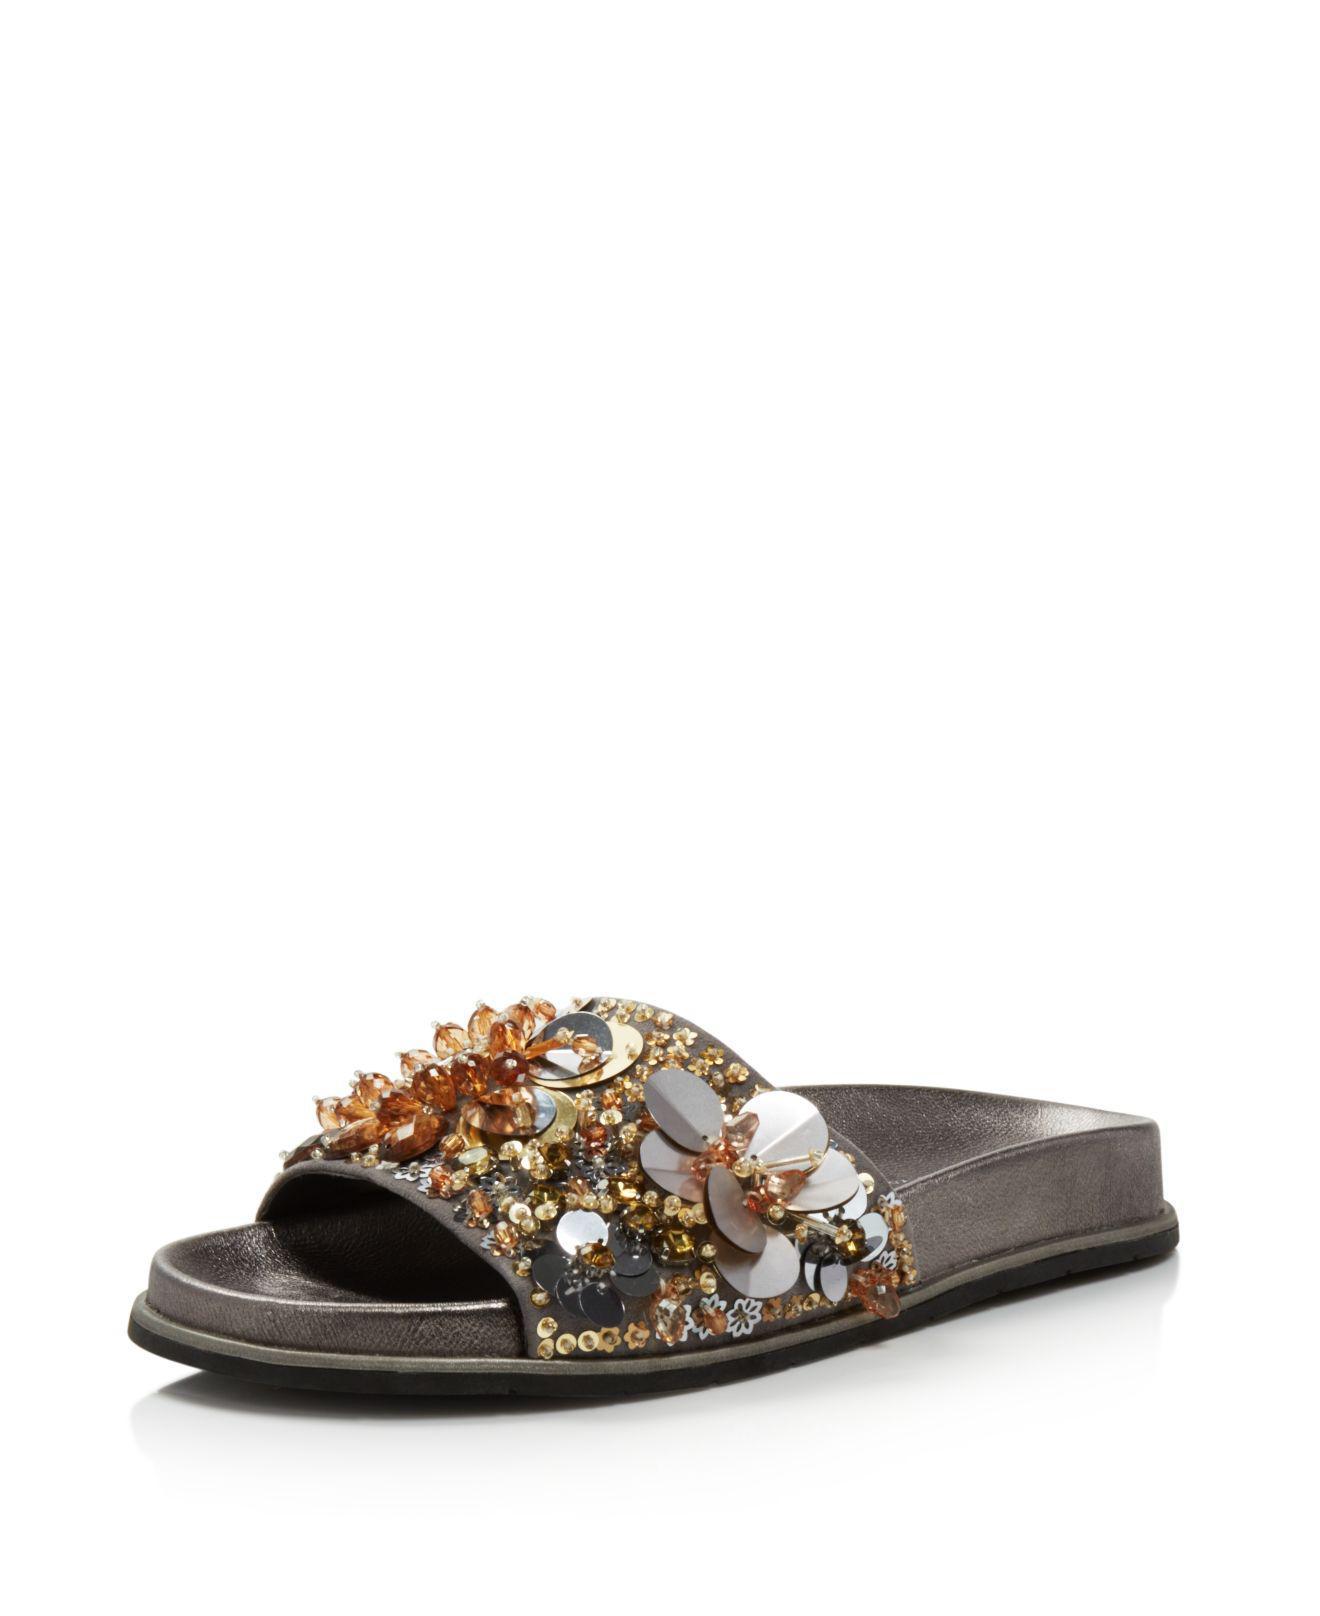 Kenneth Cole Women's Xenia Sequin-Embellished Pool Slide Sandals O5ElEZIH7